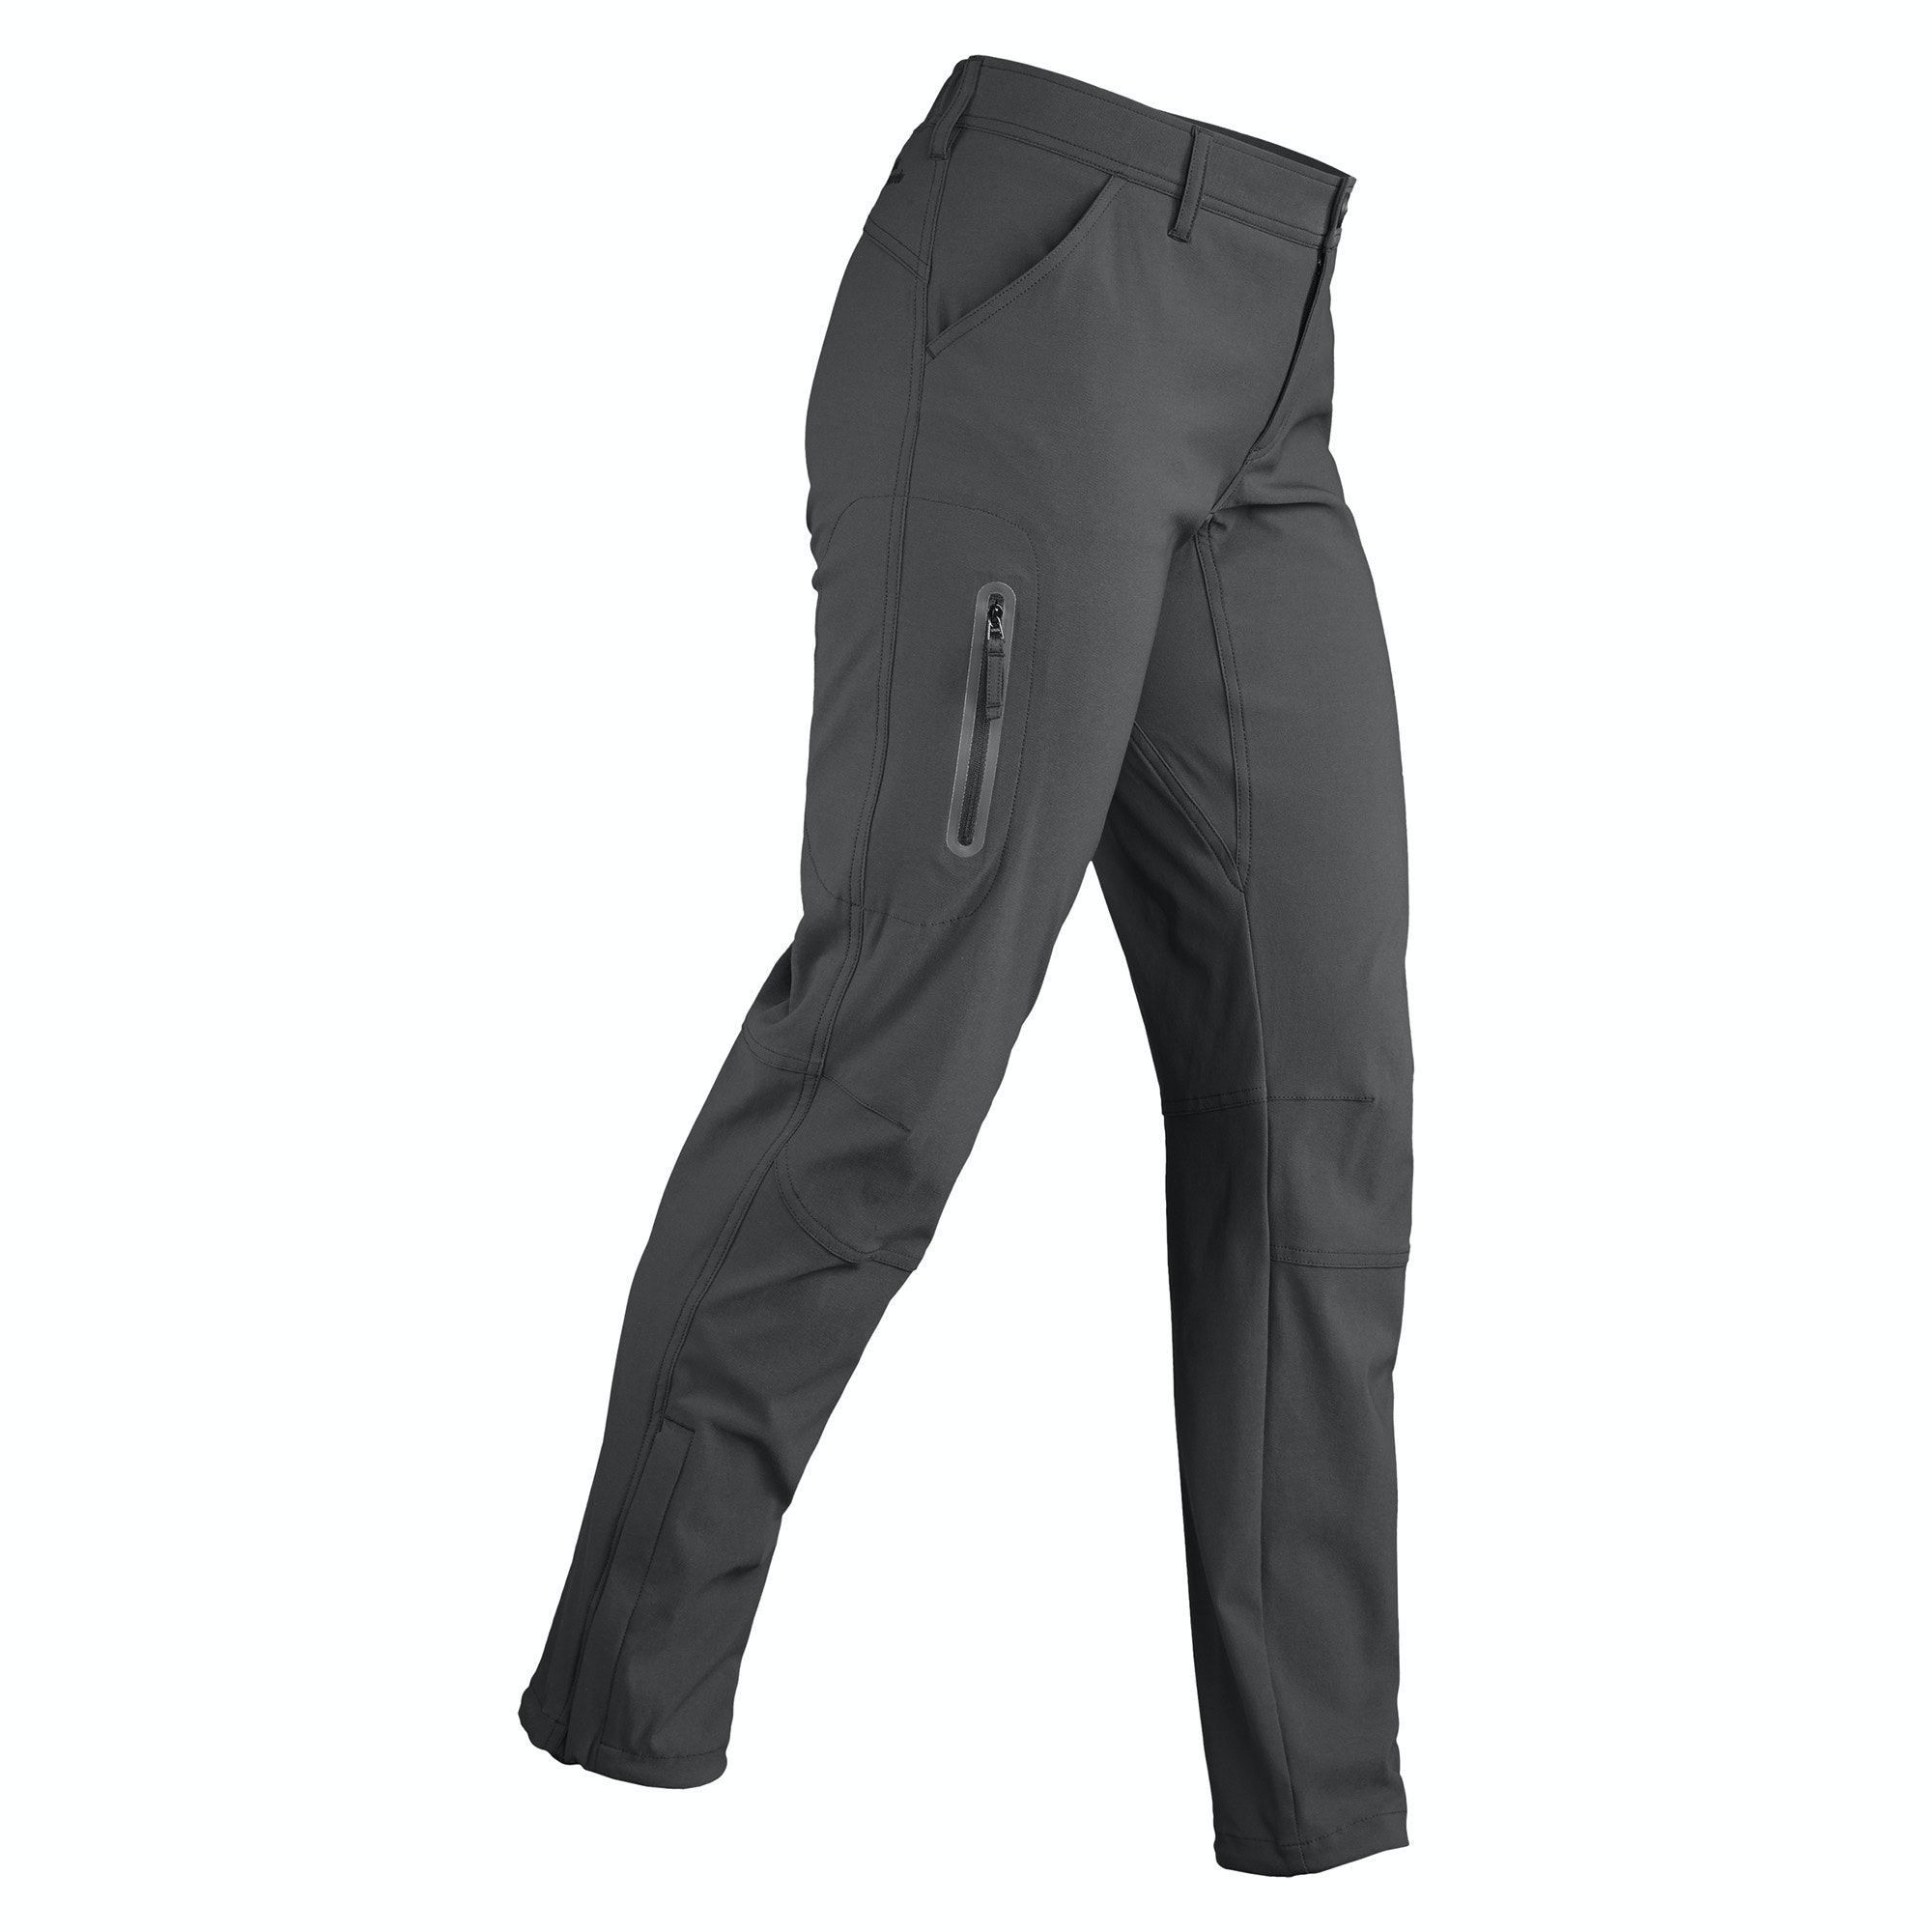 NEW-Kathmandu-Eris-Women-039-s-Softshell-Hiking-Pants-Trousers-v2-Zip-Hem-Over-Boots thumbnail 7